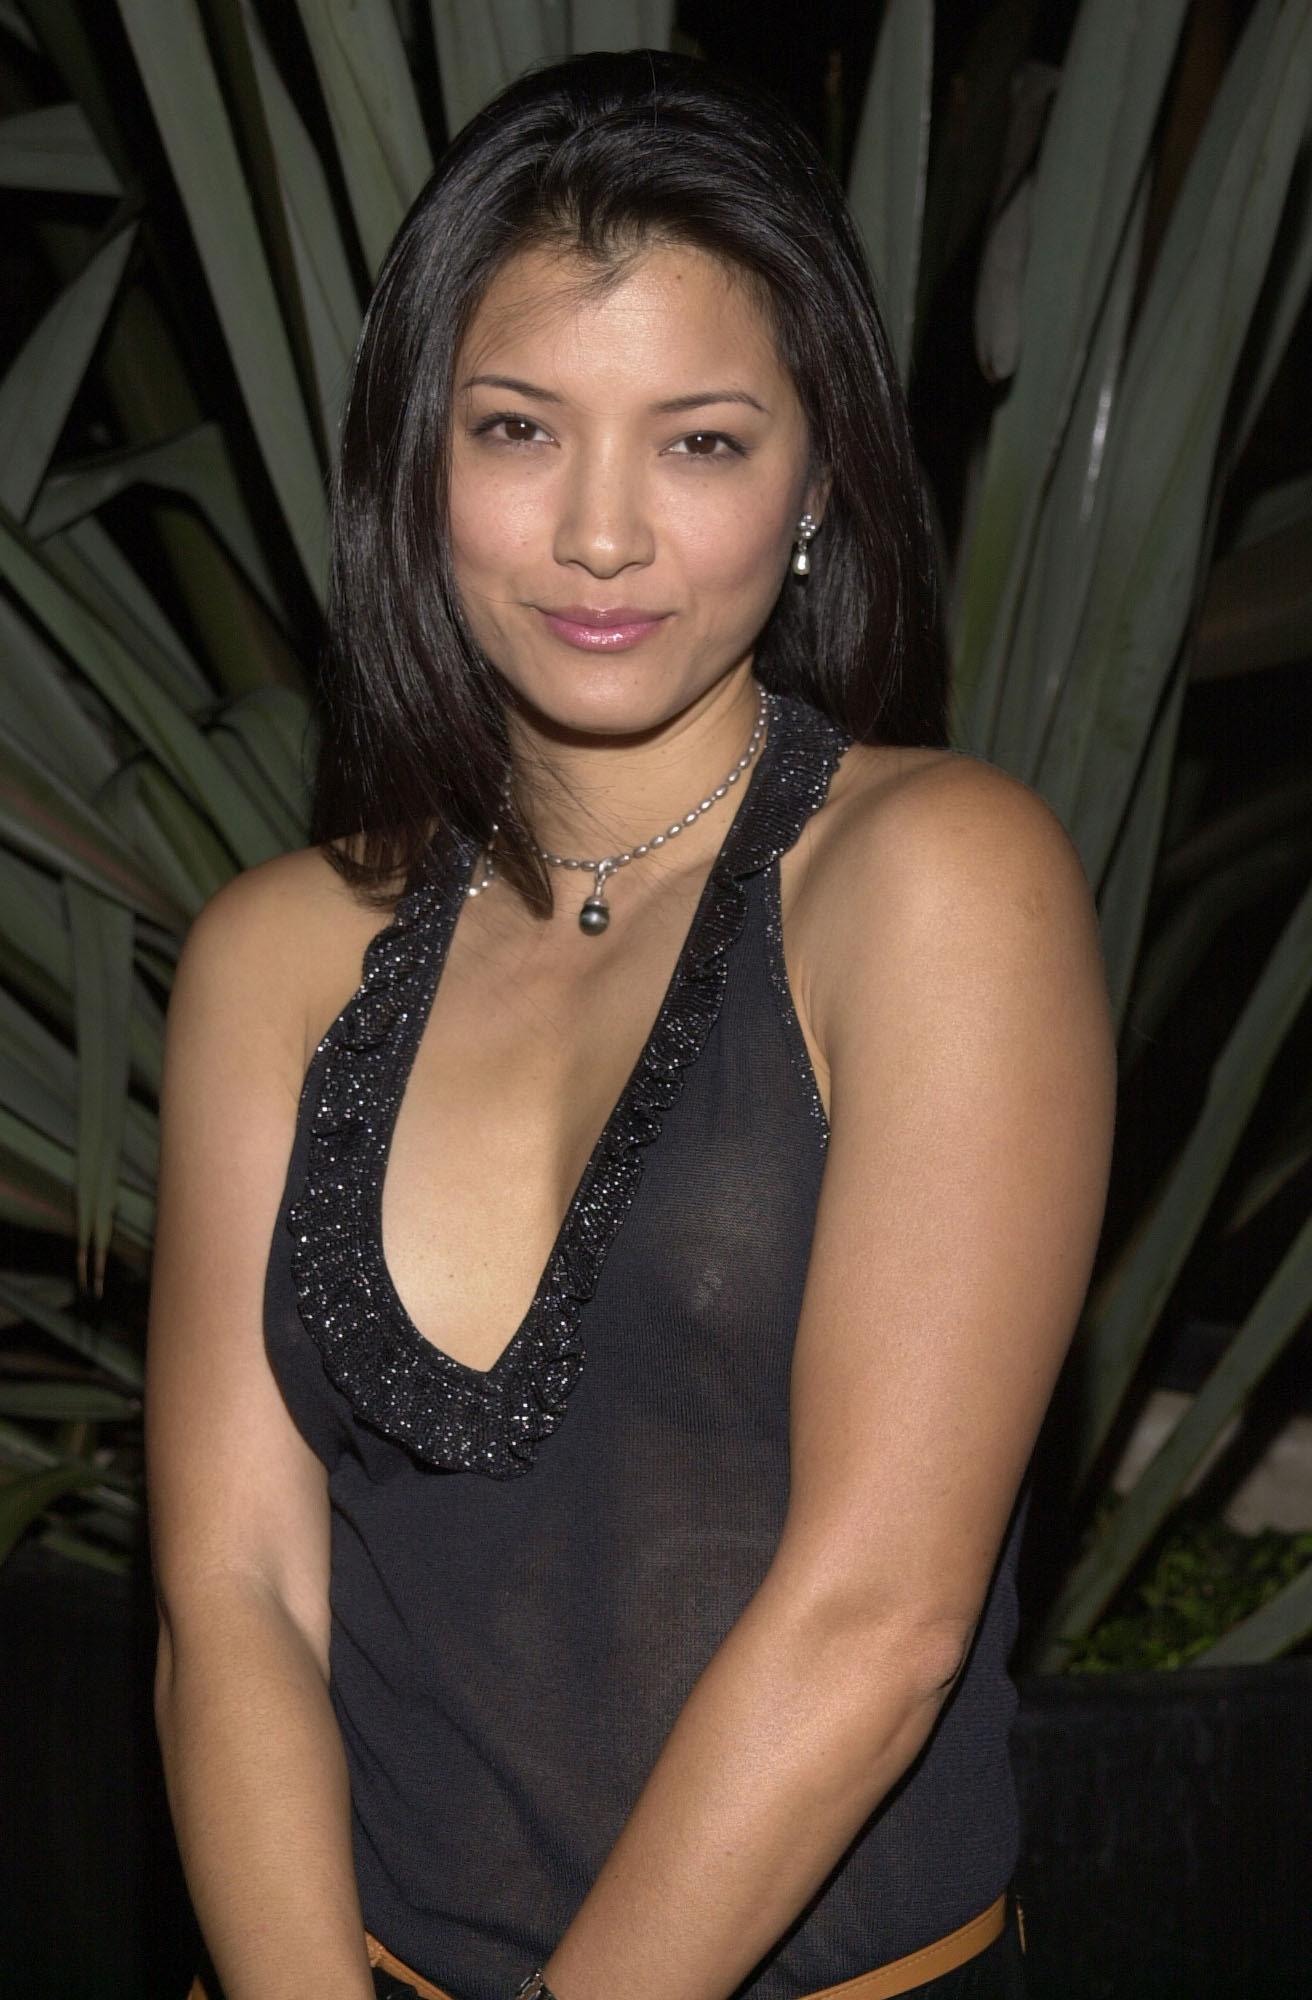 Kelly Hu nude celebrity - Celebrity leaked Nudes